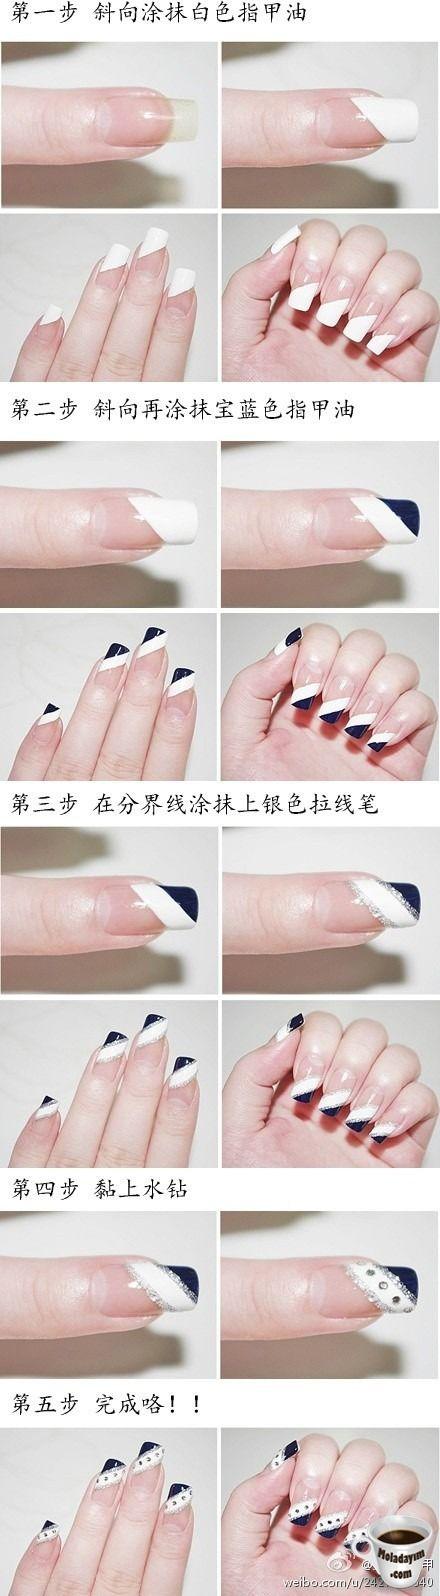 20130408030718_VhSFe.thumb.700_0